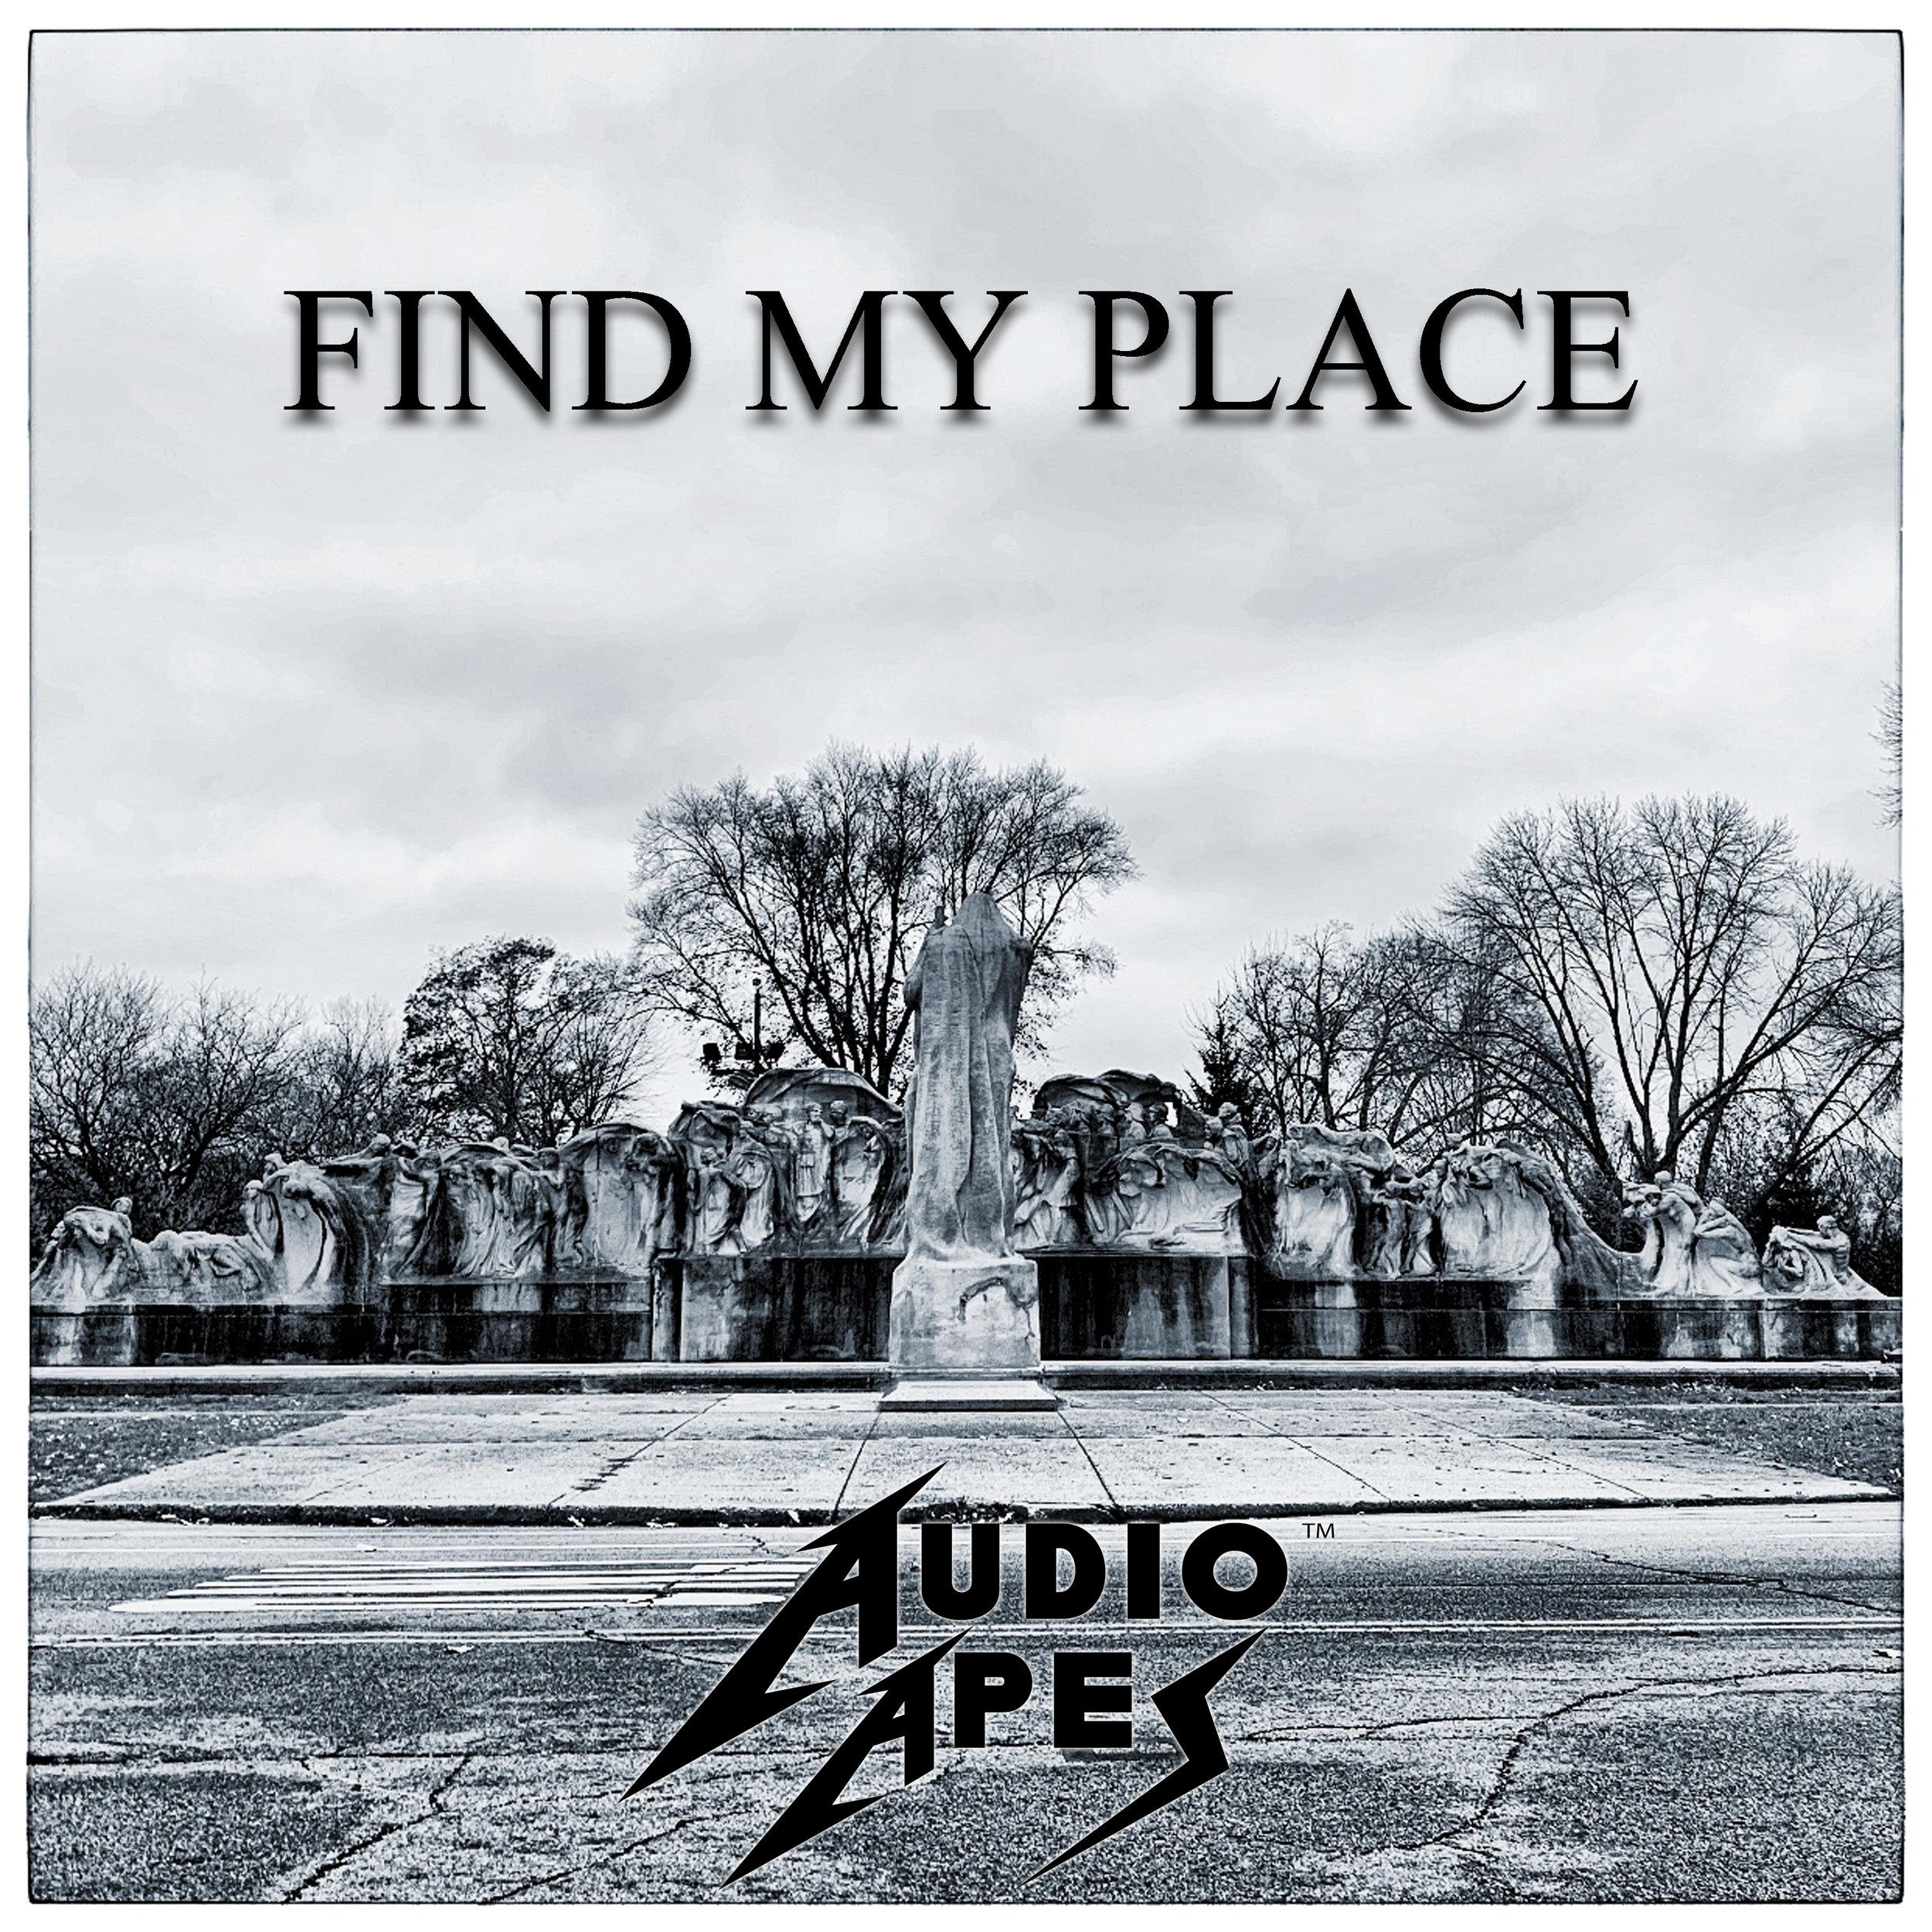 Find My Place Artwork 3000 x 3000.jpg